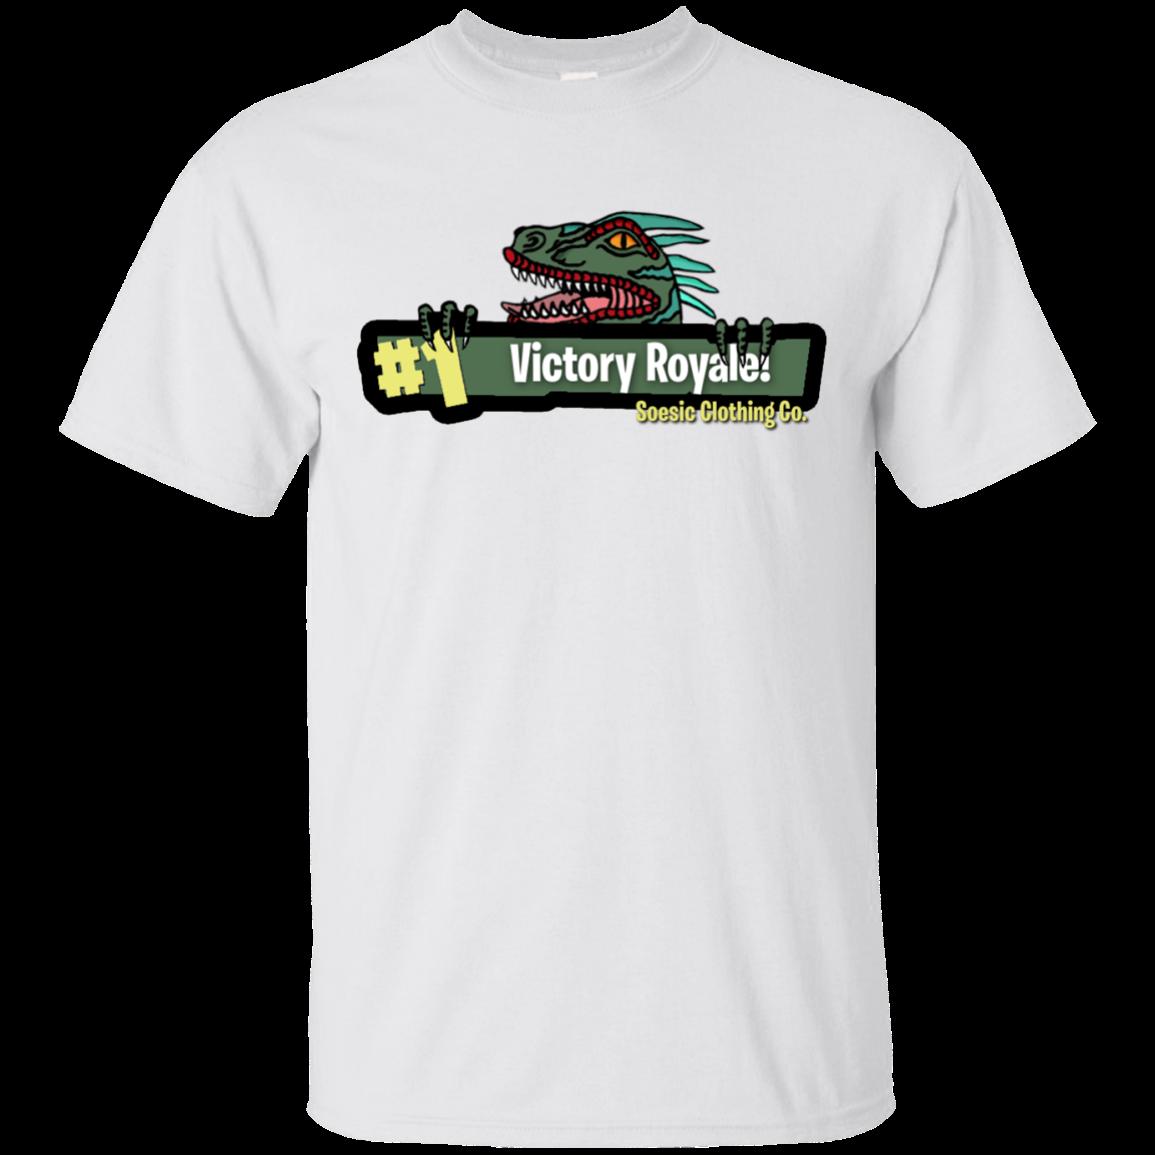 Eat Sleep Fortnite Repeat For Gamer 1 Victory Royale Fortnite Shirts Gift Trending Design T Shirt Daily Shirt Nfl T Shirts Long Sleeve Sweatshirts